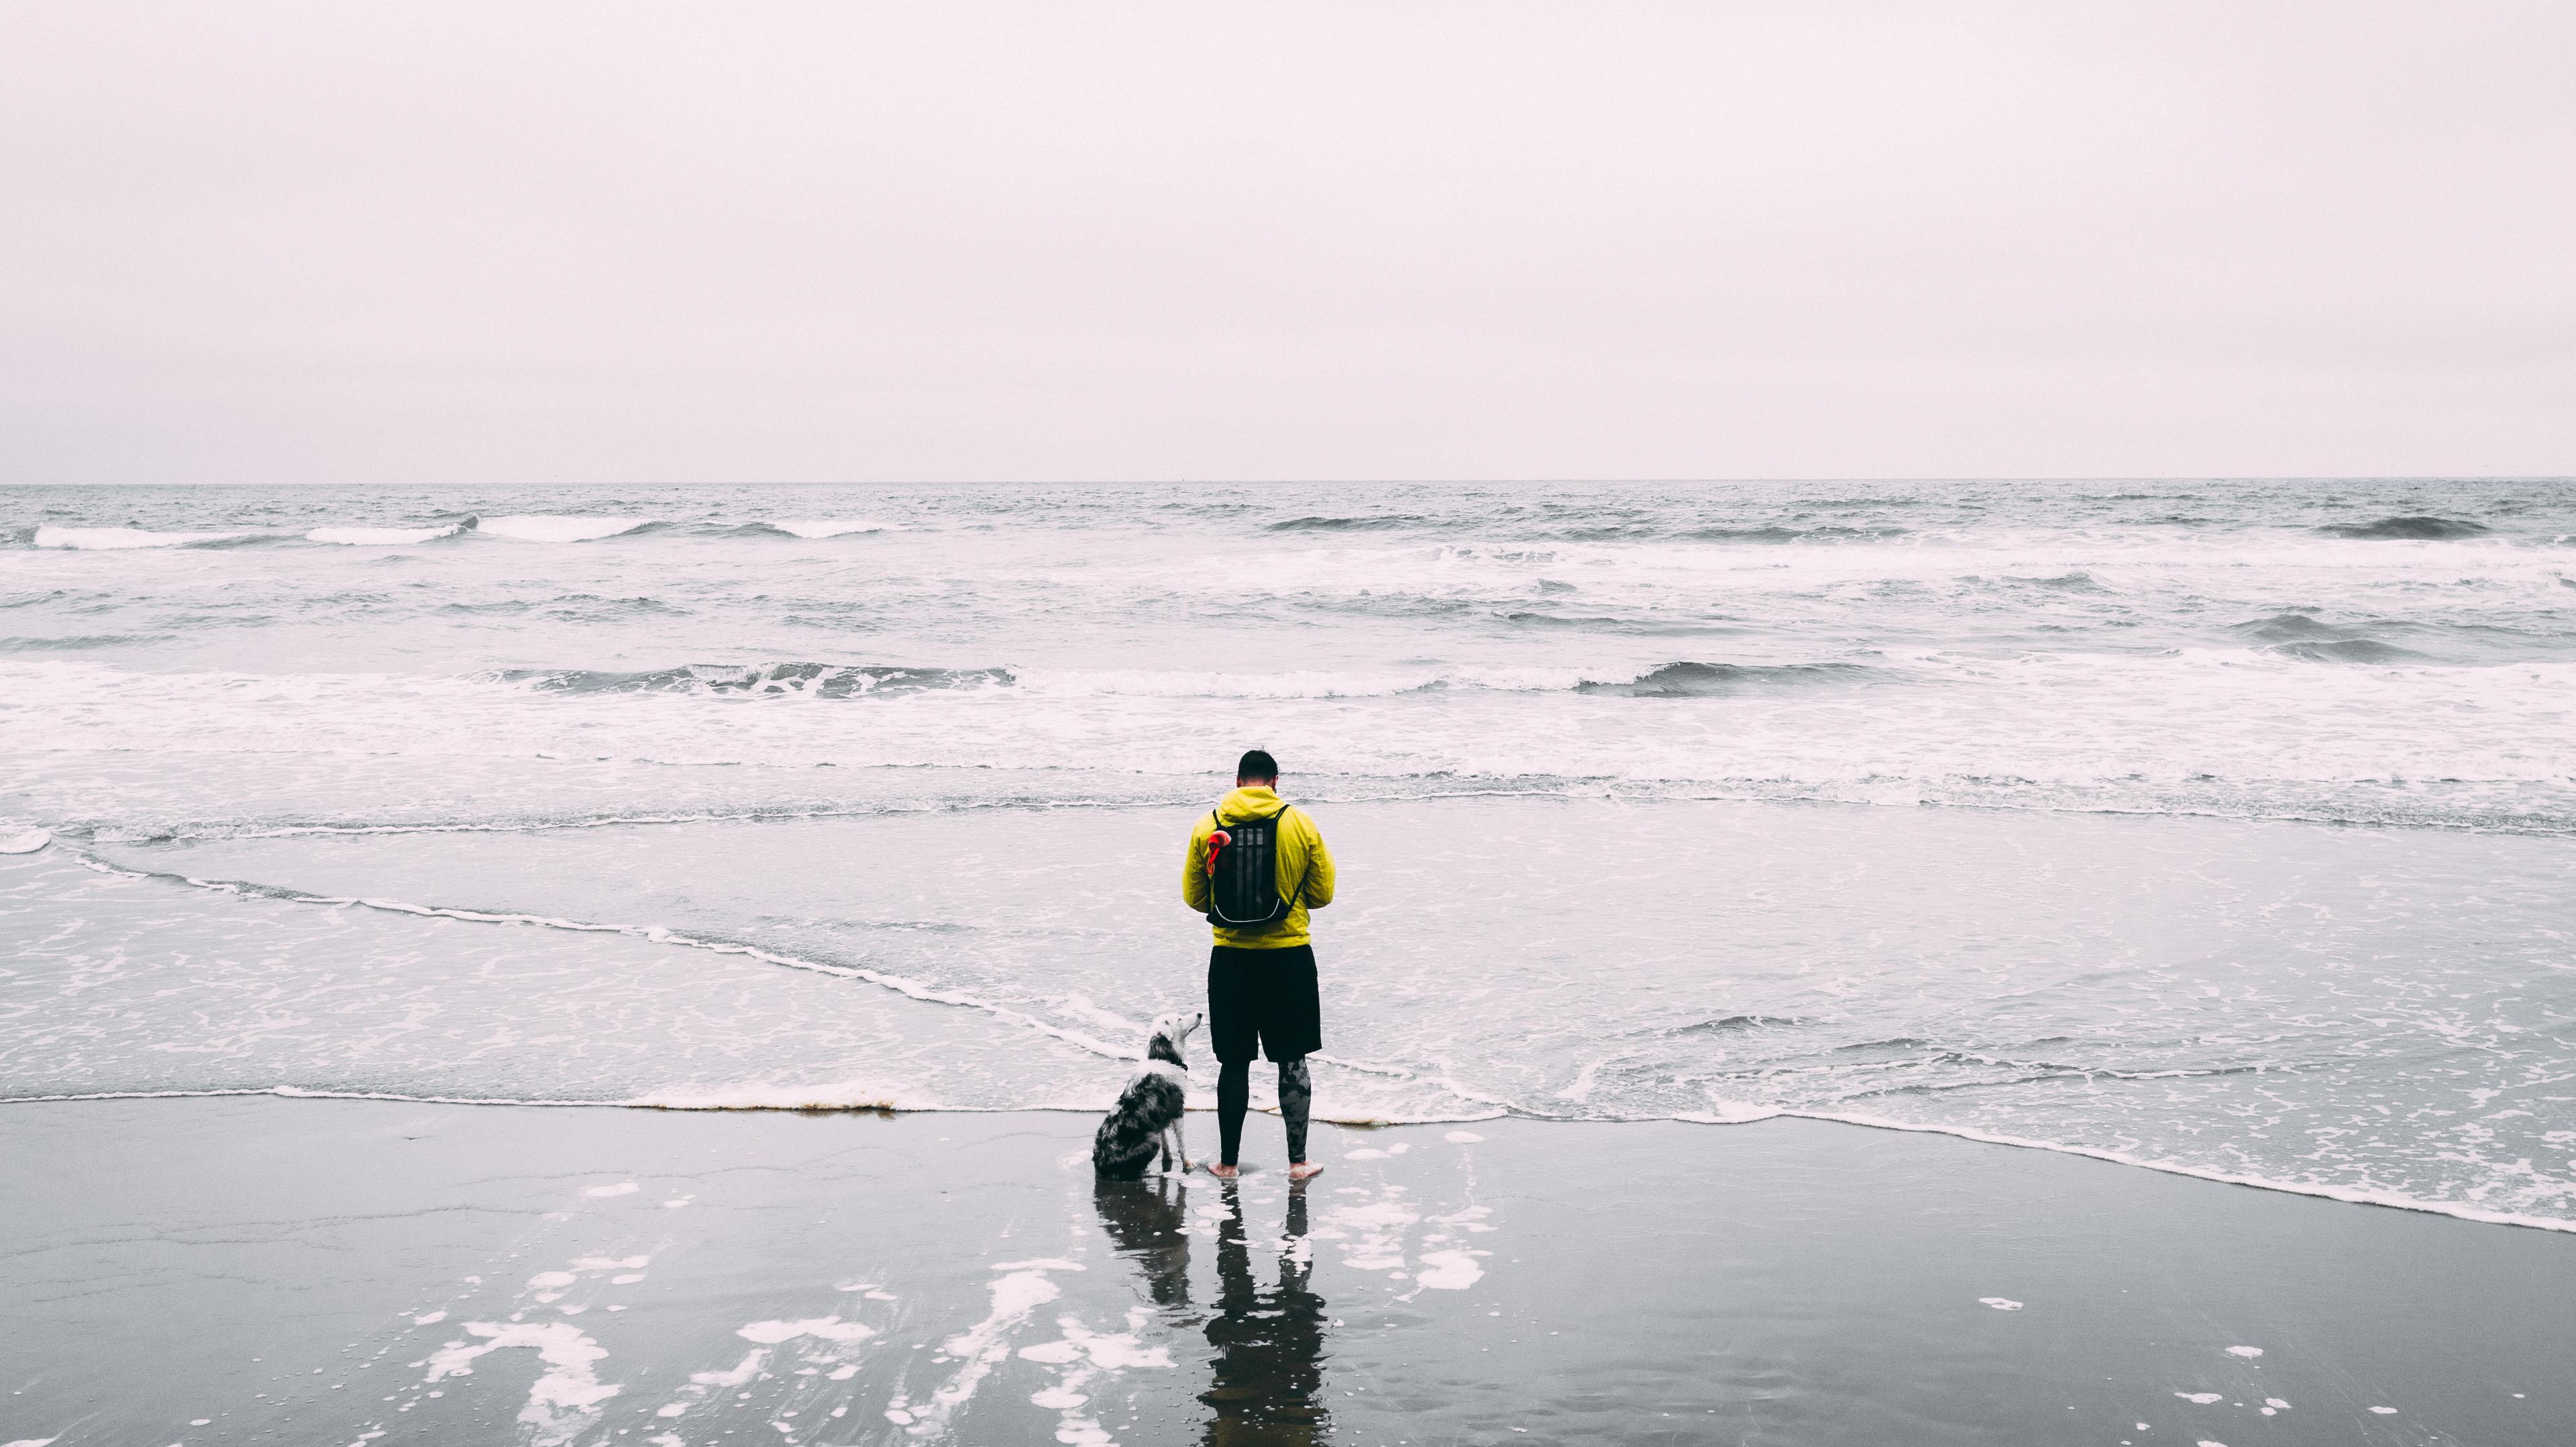 beach-clean-up-arash-malek